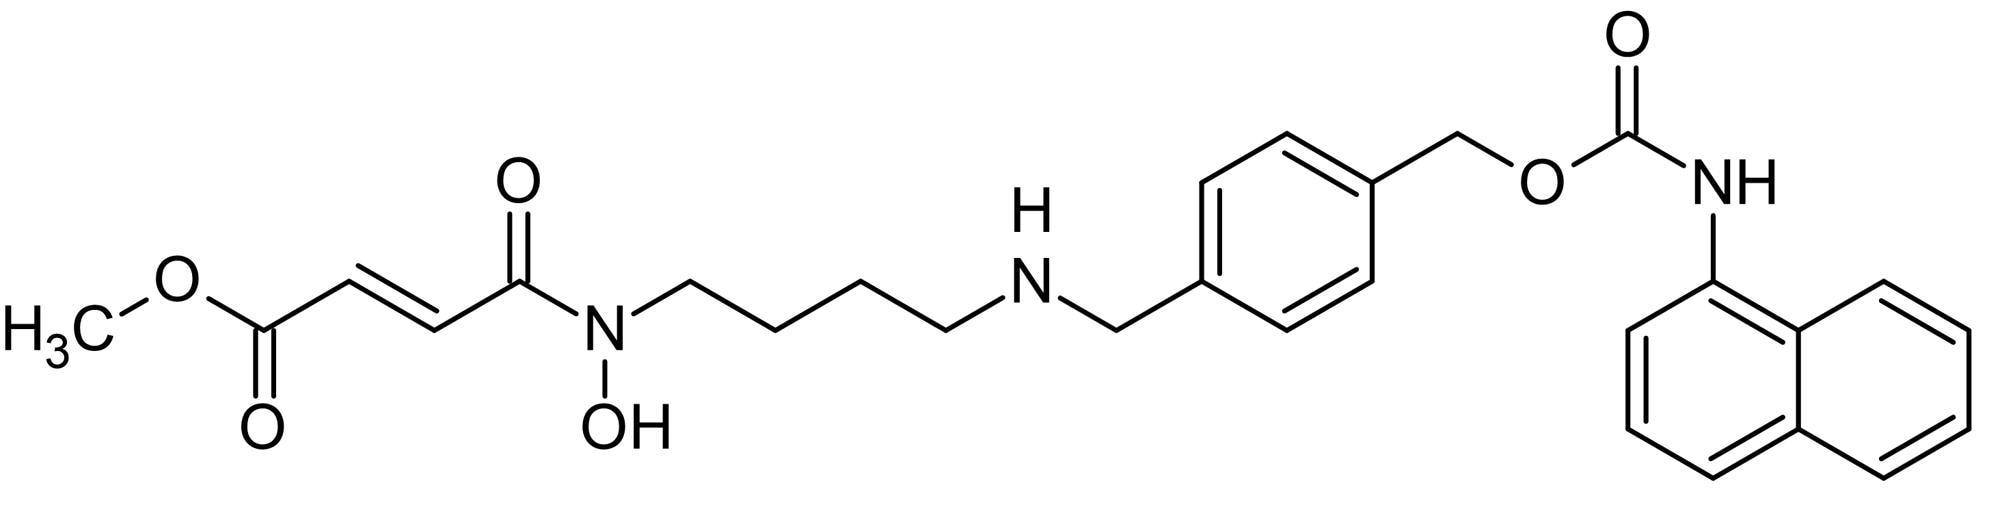 Chemical Structure - Methylstat, jumonji C domain-containing histone demethylase inhibitor (ab144566)